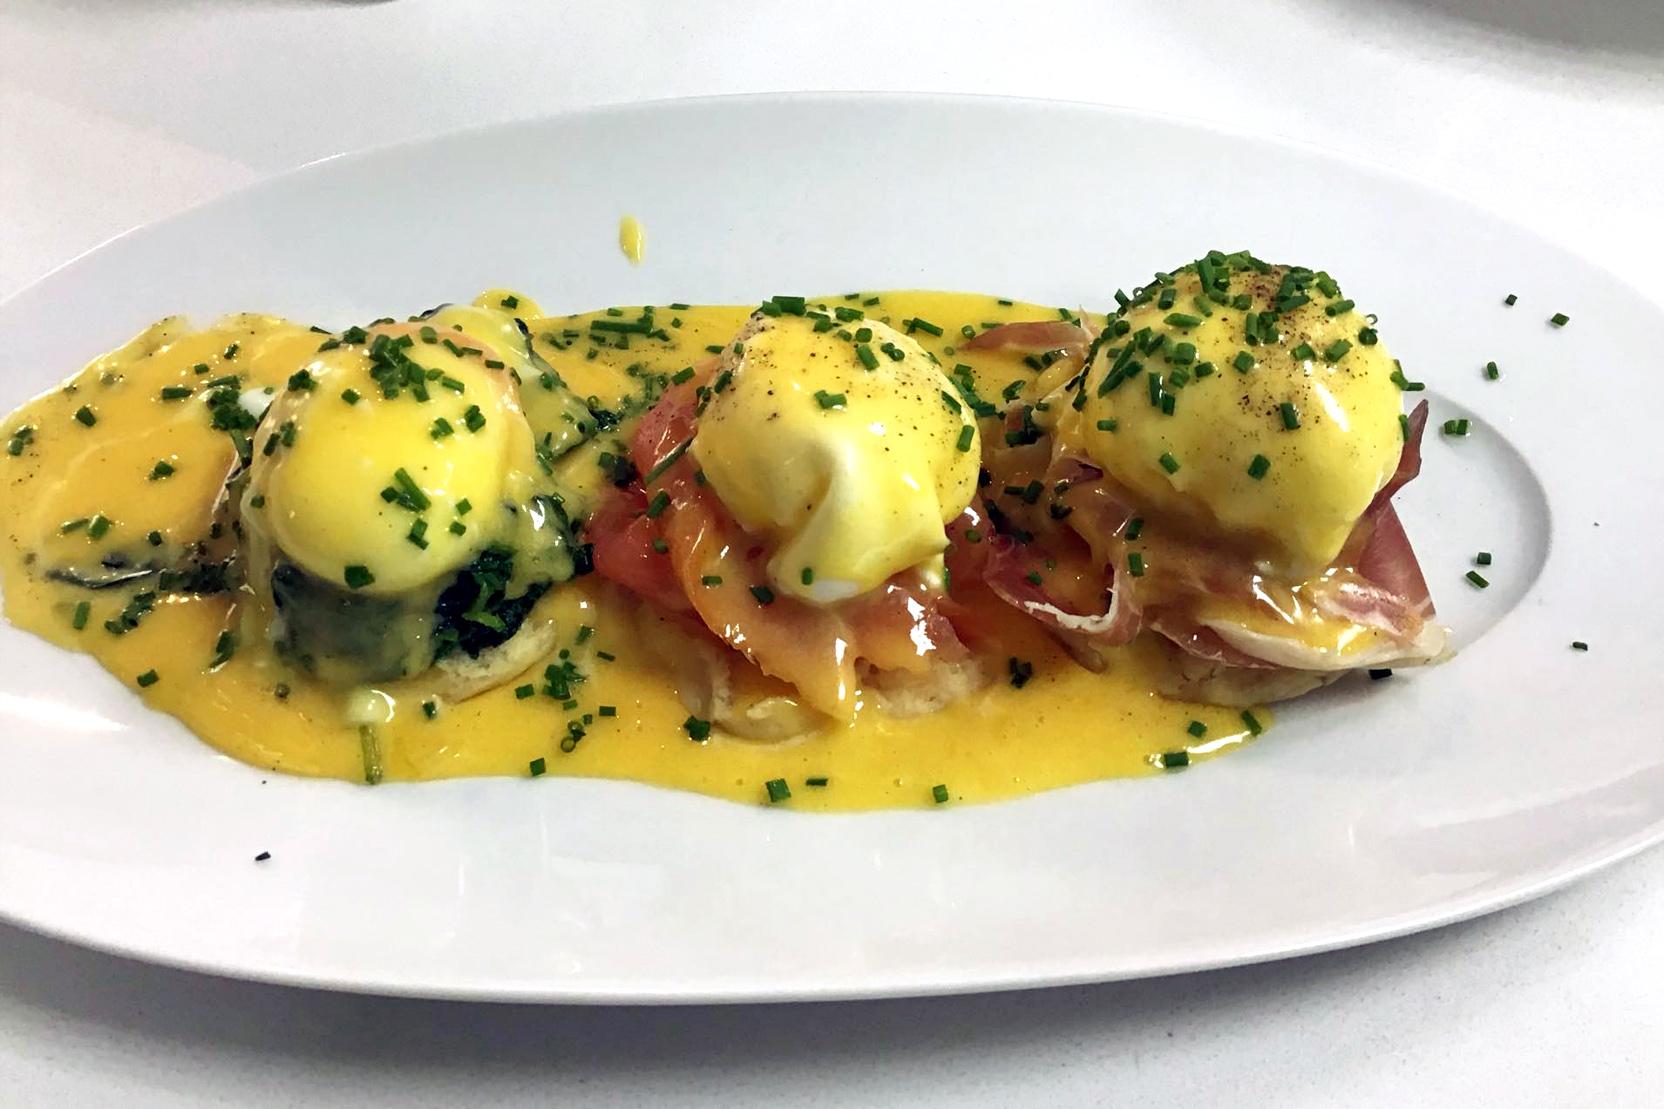 Brunch and All About Eggs, με τον chef Patron Βασίλη Σπόρο #PraxisGastronomyDays